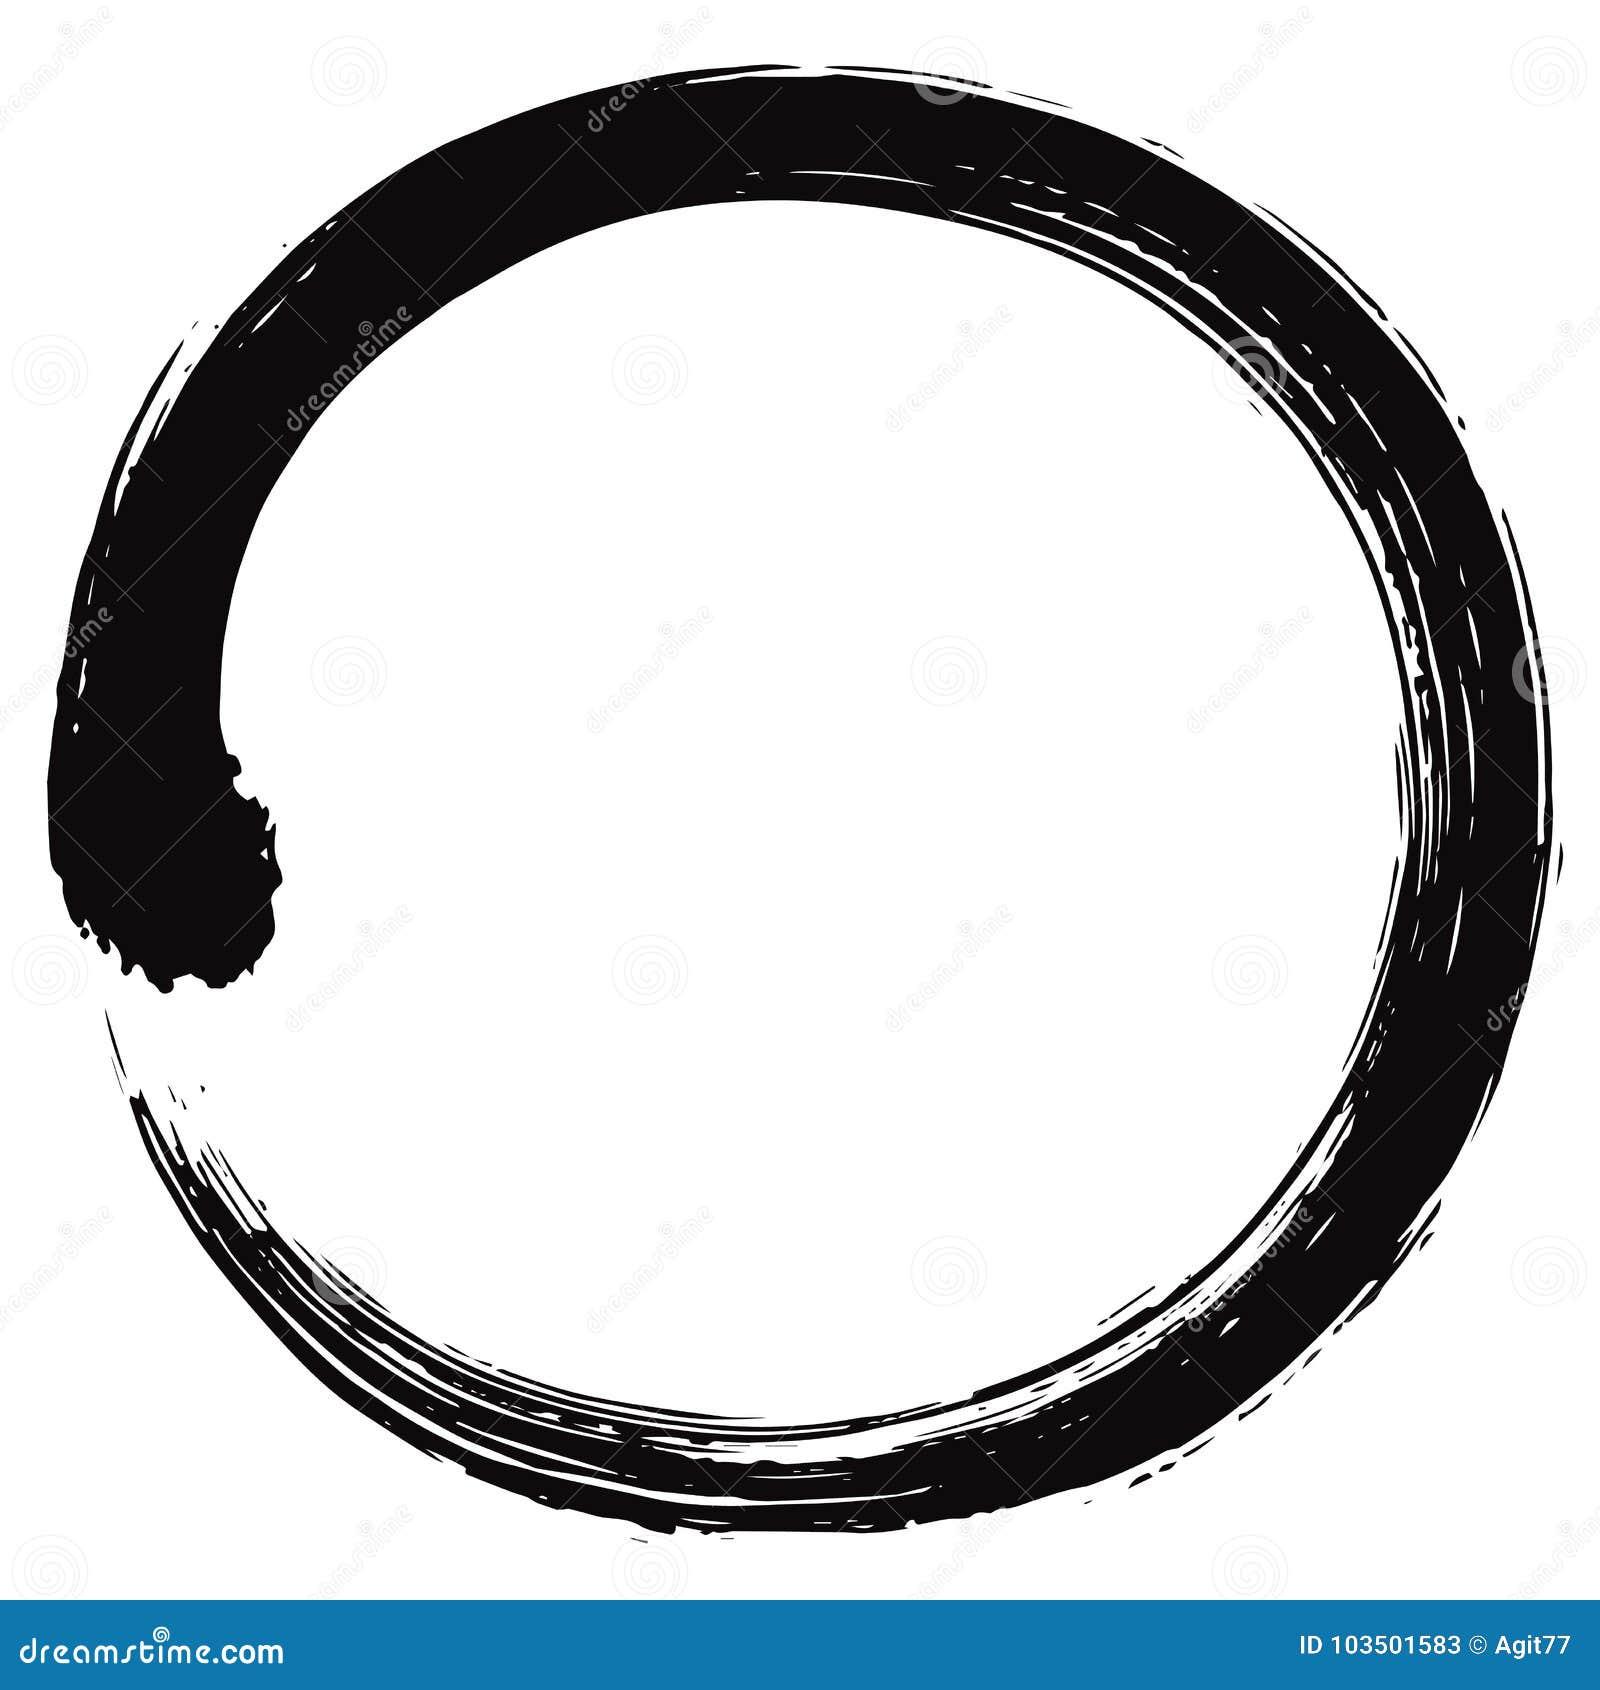 Japonais Enso Zen Circle Brush Vector